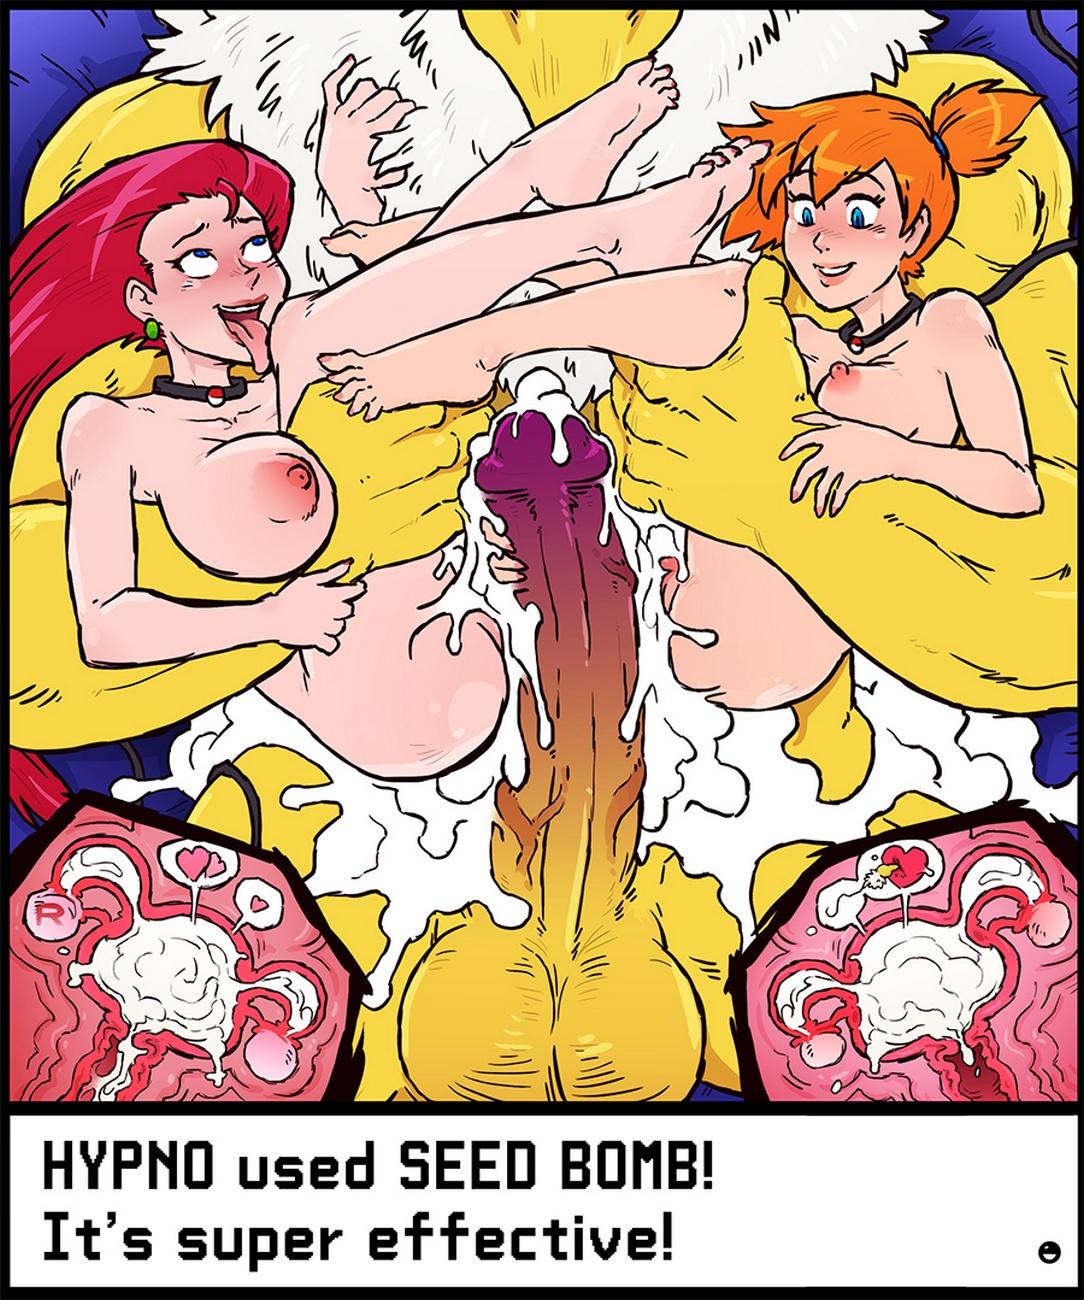 Hypno-Tized